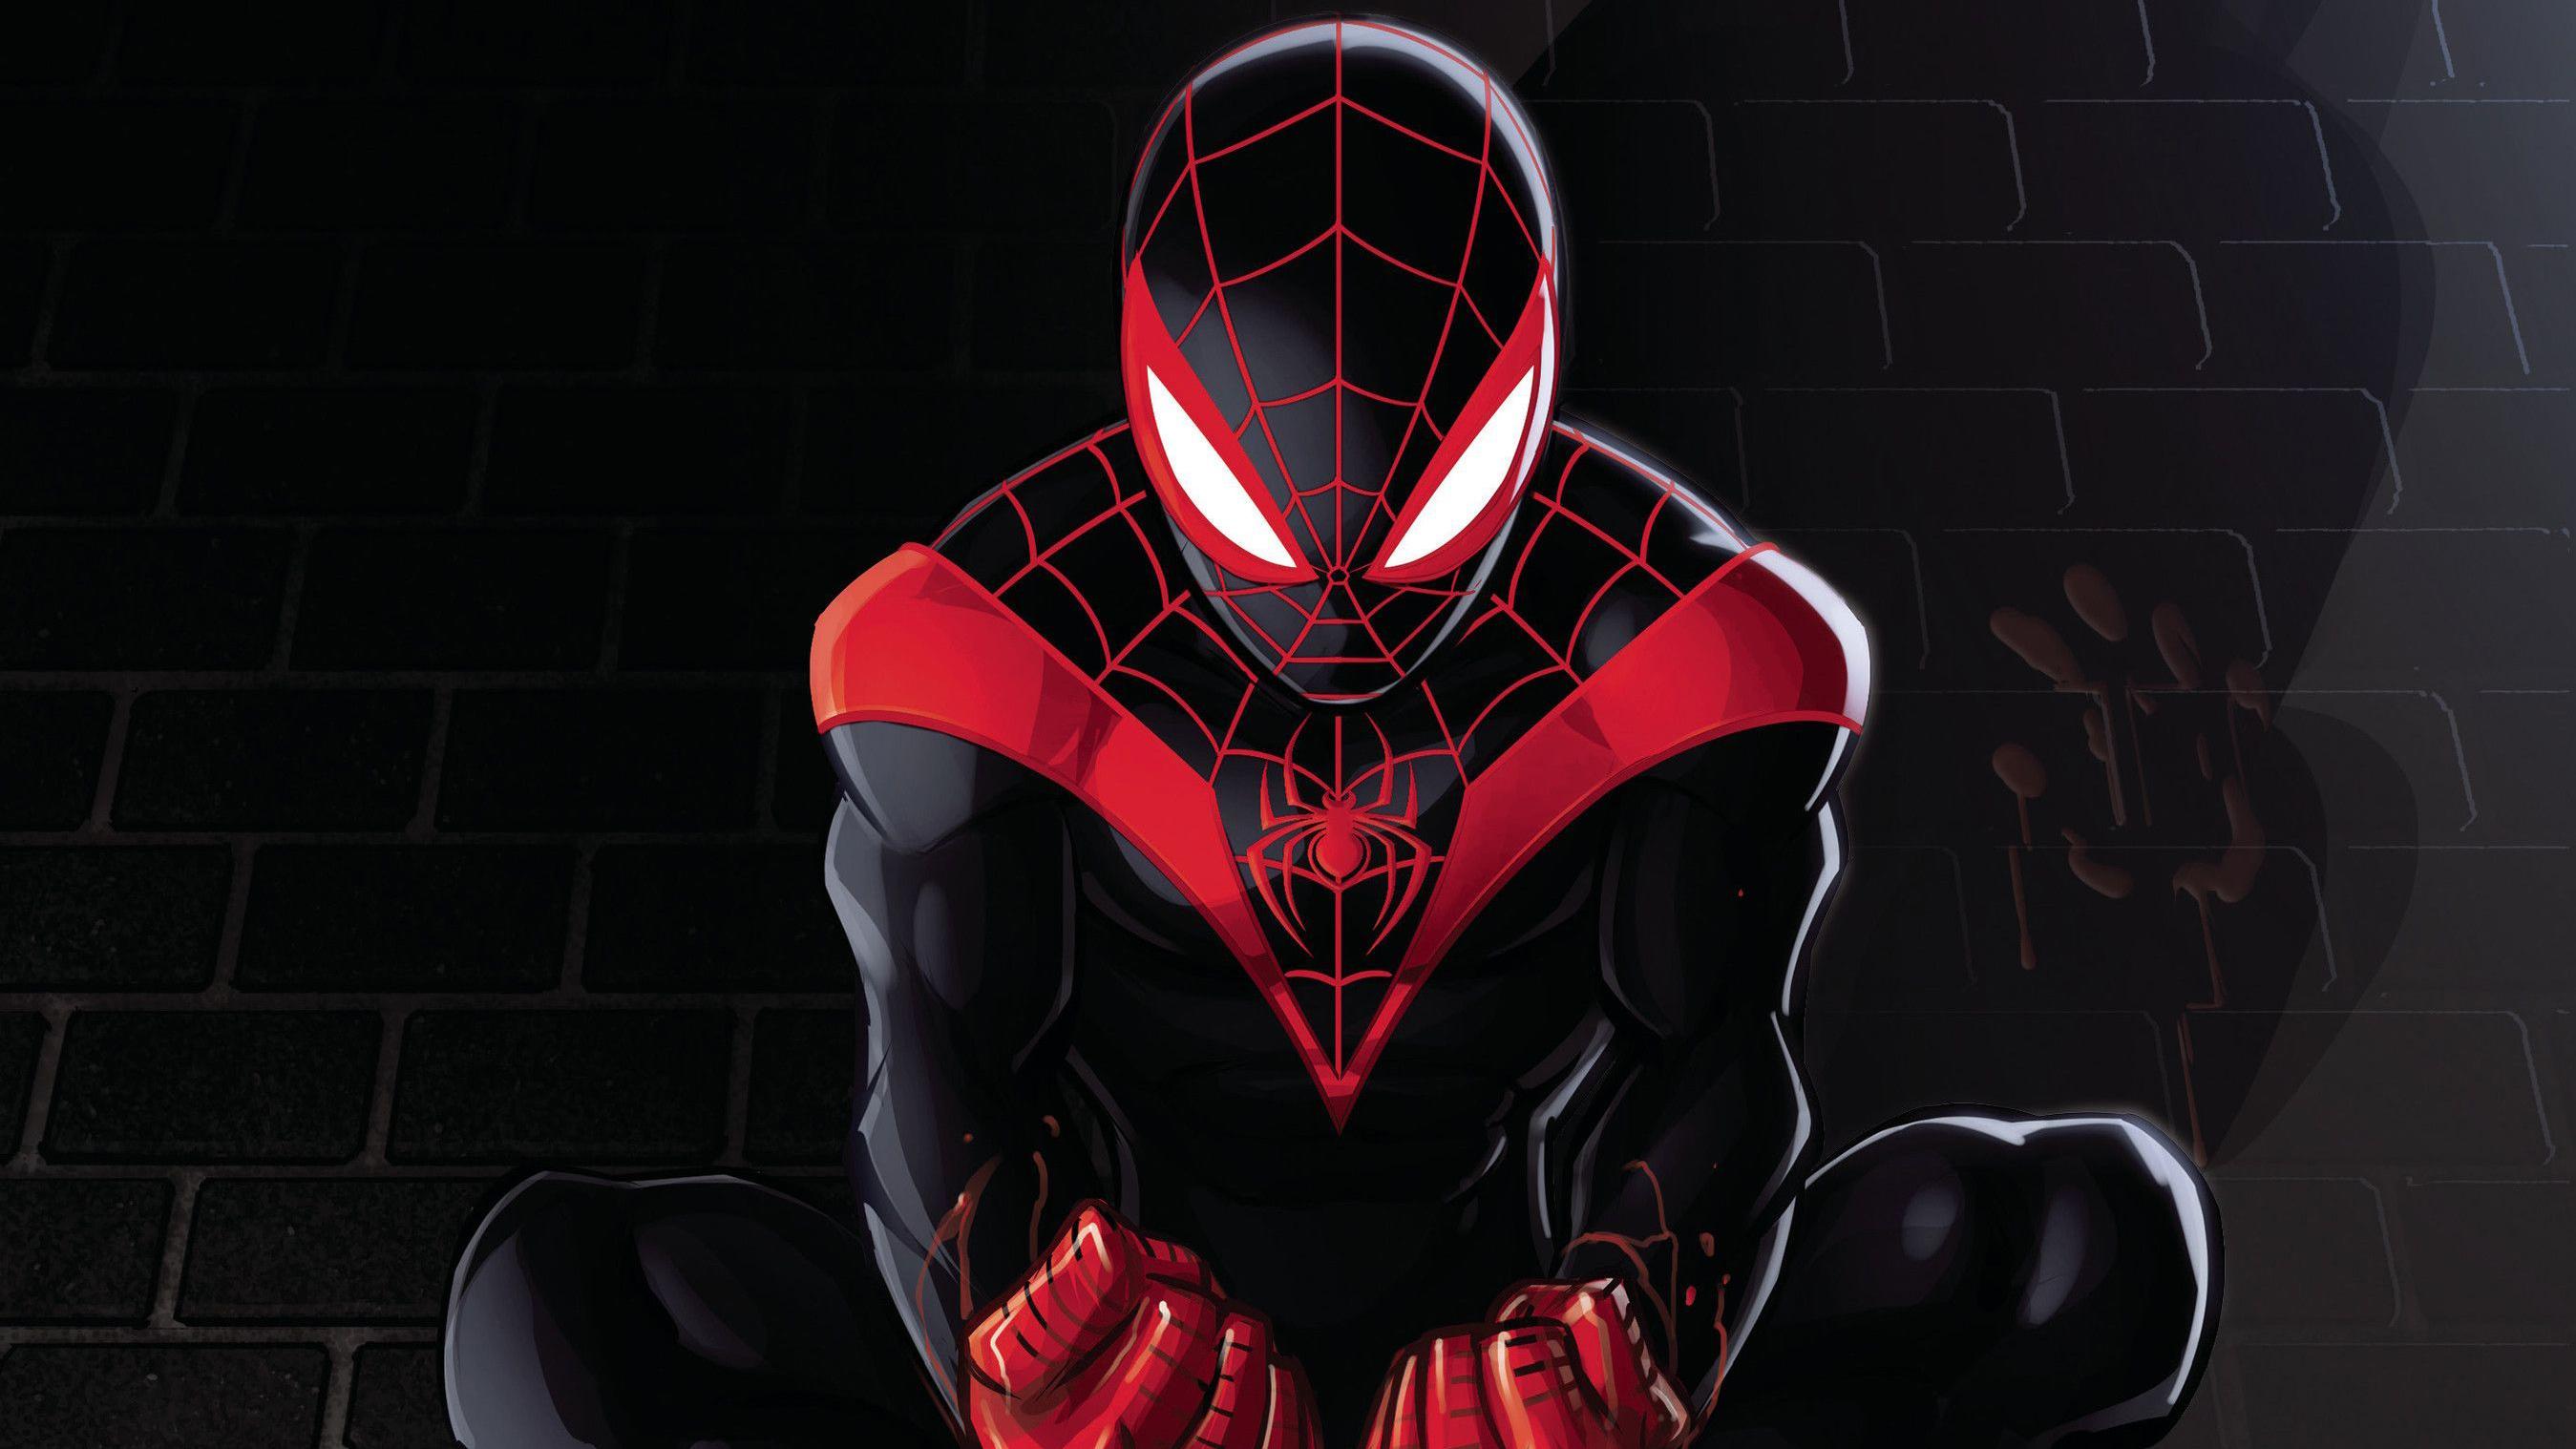 1920x1080 Spiderman Miles Morales Artwork 2018 Laptop Full ...